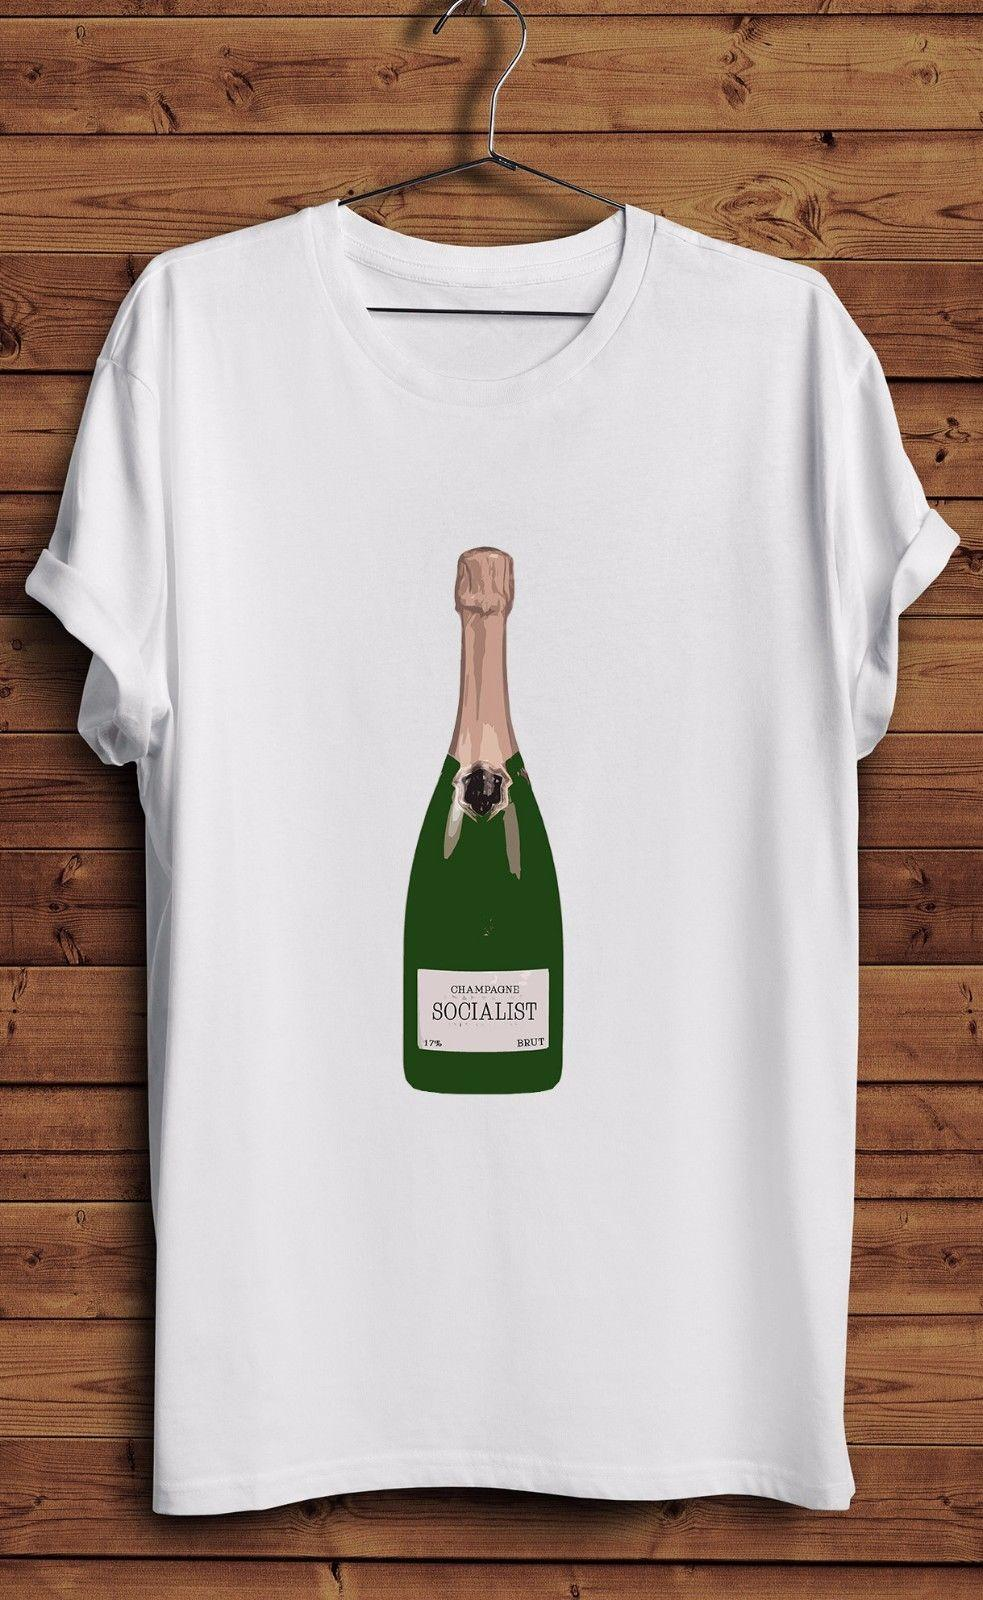 2706eefa168e7 Champagne Socialist T Shirt Rich Kids Socialism Labour Corbyn Left Wing  LiberalFunny free shipping Unisex Casual Tshirt